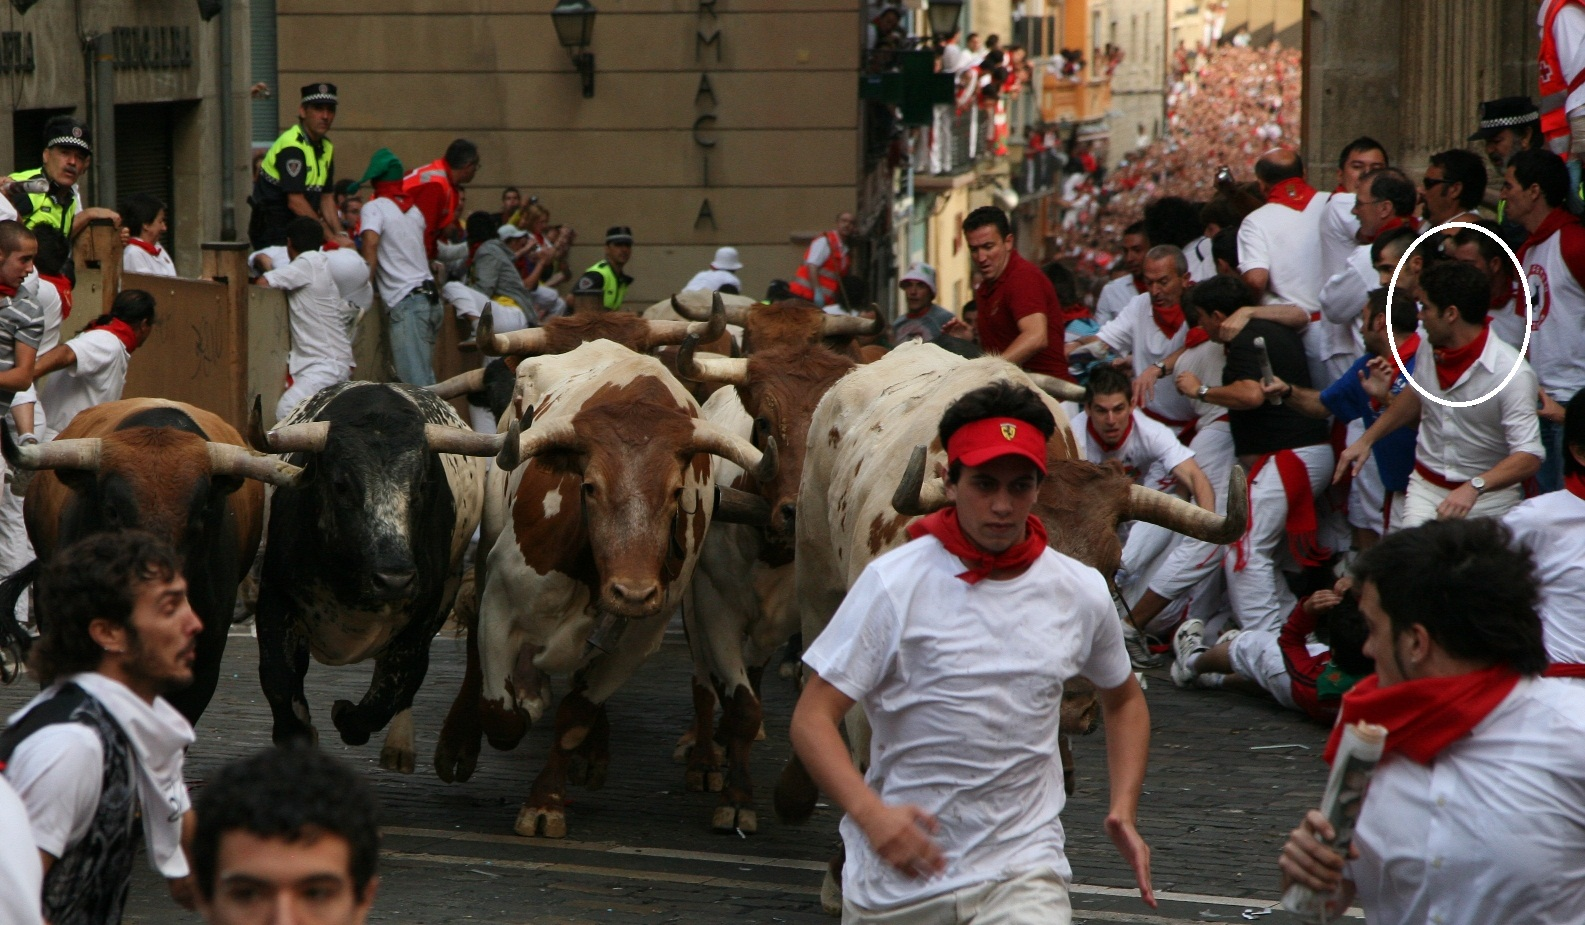 Šokantni običaji u svijetu Afh-corriendo-los-toros-de-miura-anc3b3n